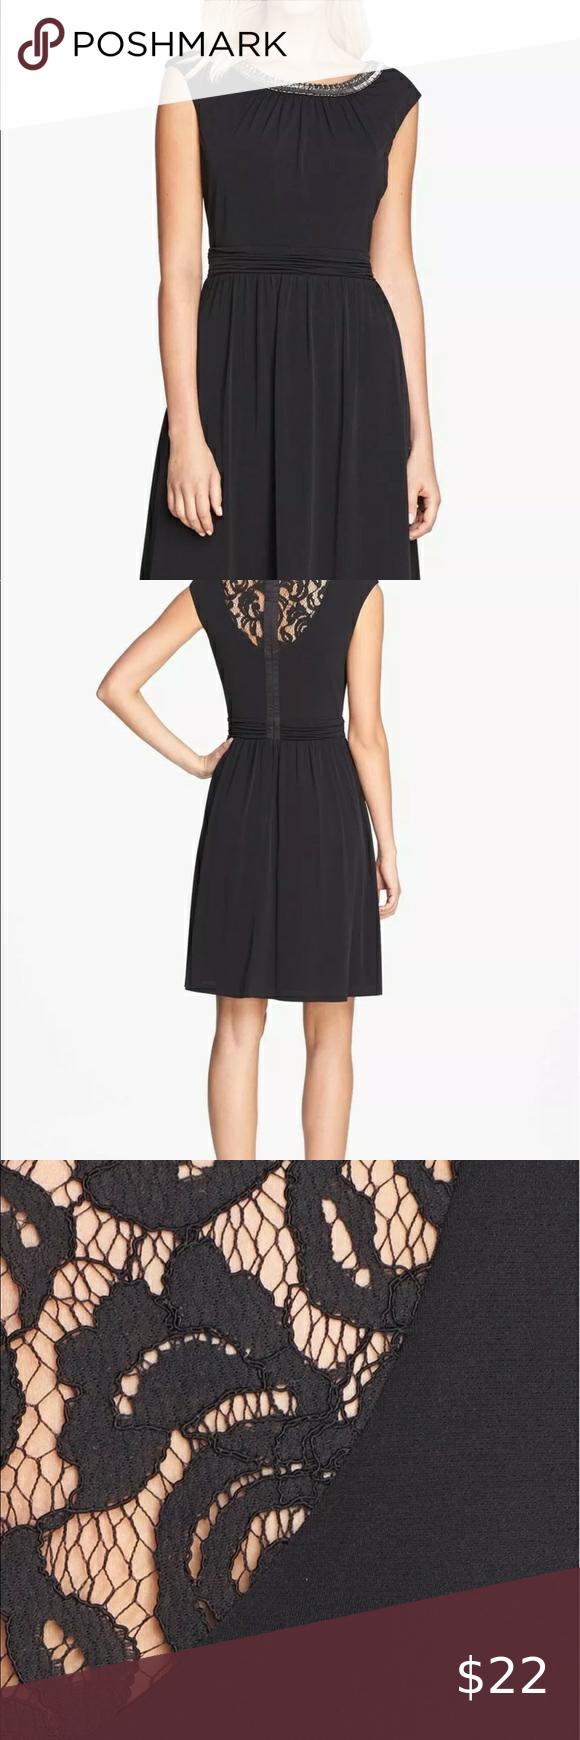 Ellen Tracy Black Gown